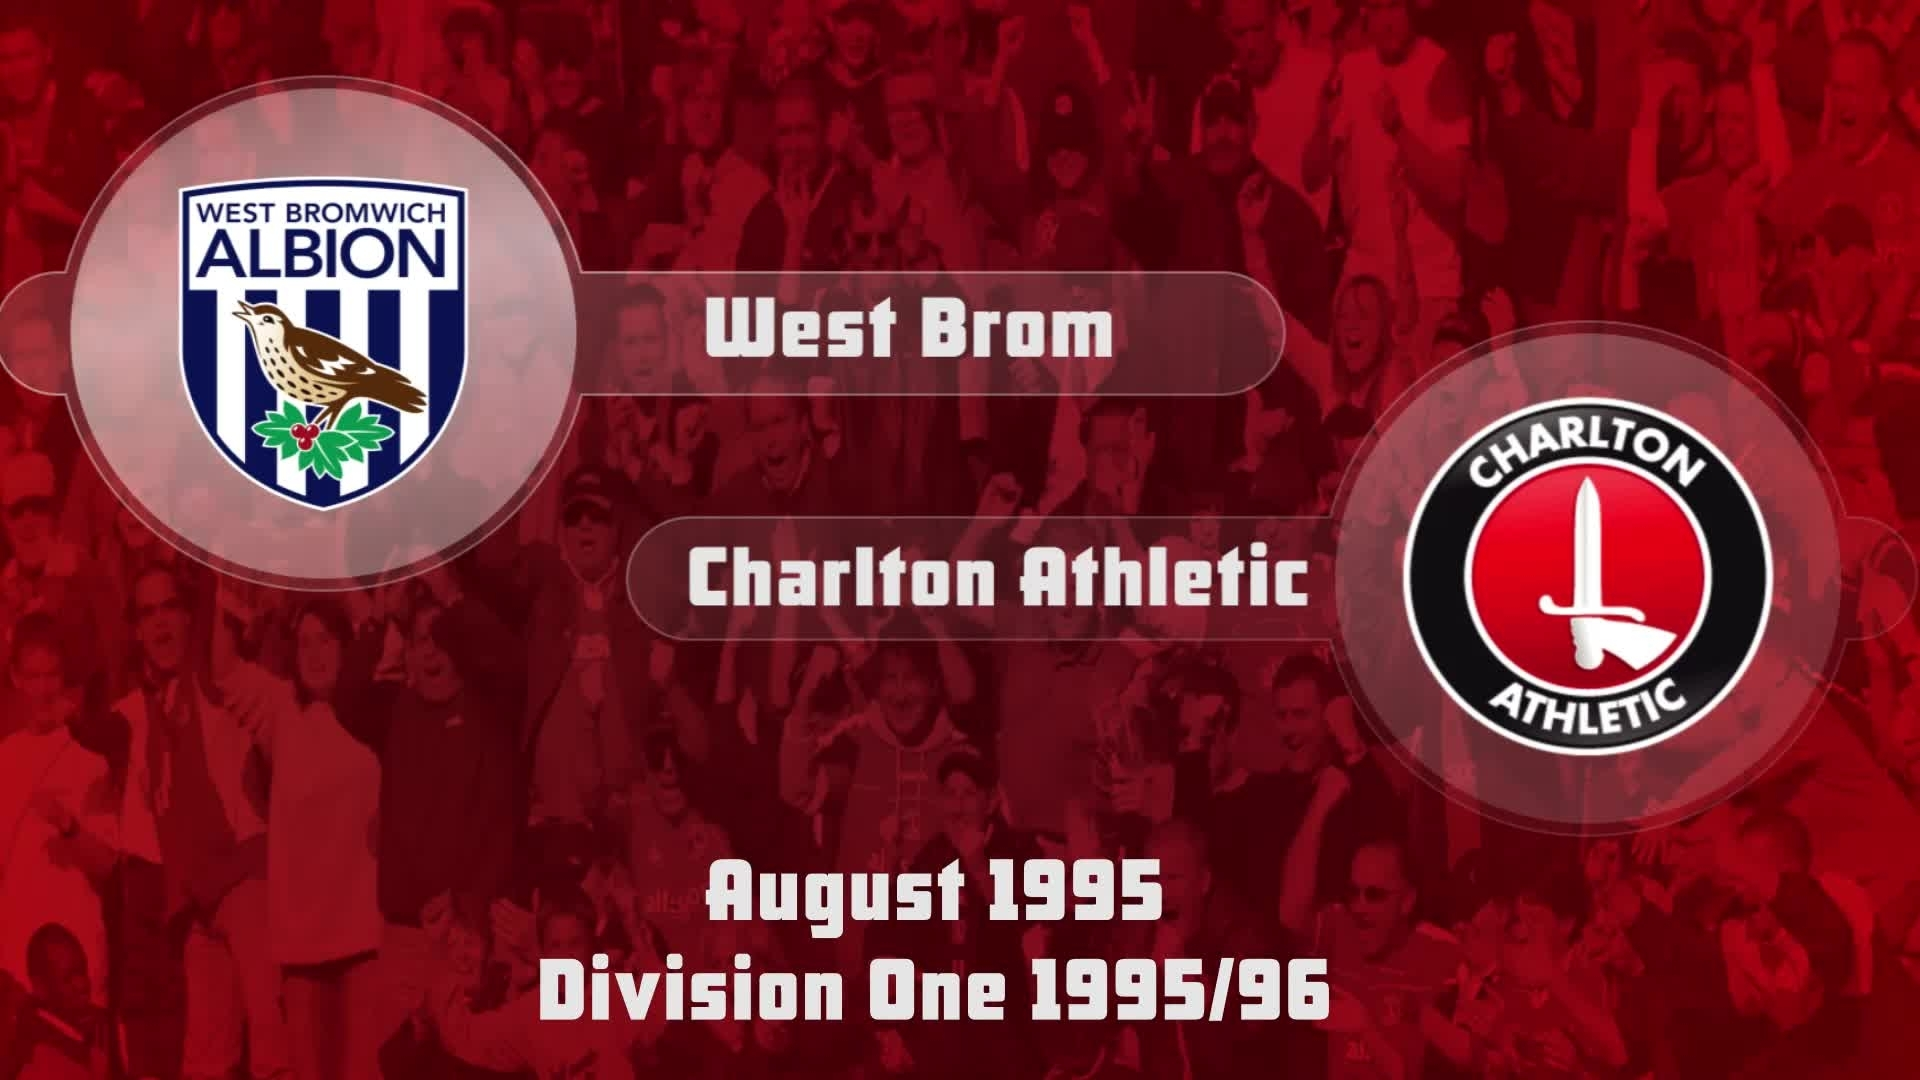 01 HIGHLIGHTS | West Brom 1 Charlton 0 (Aug 1995)